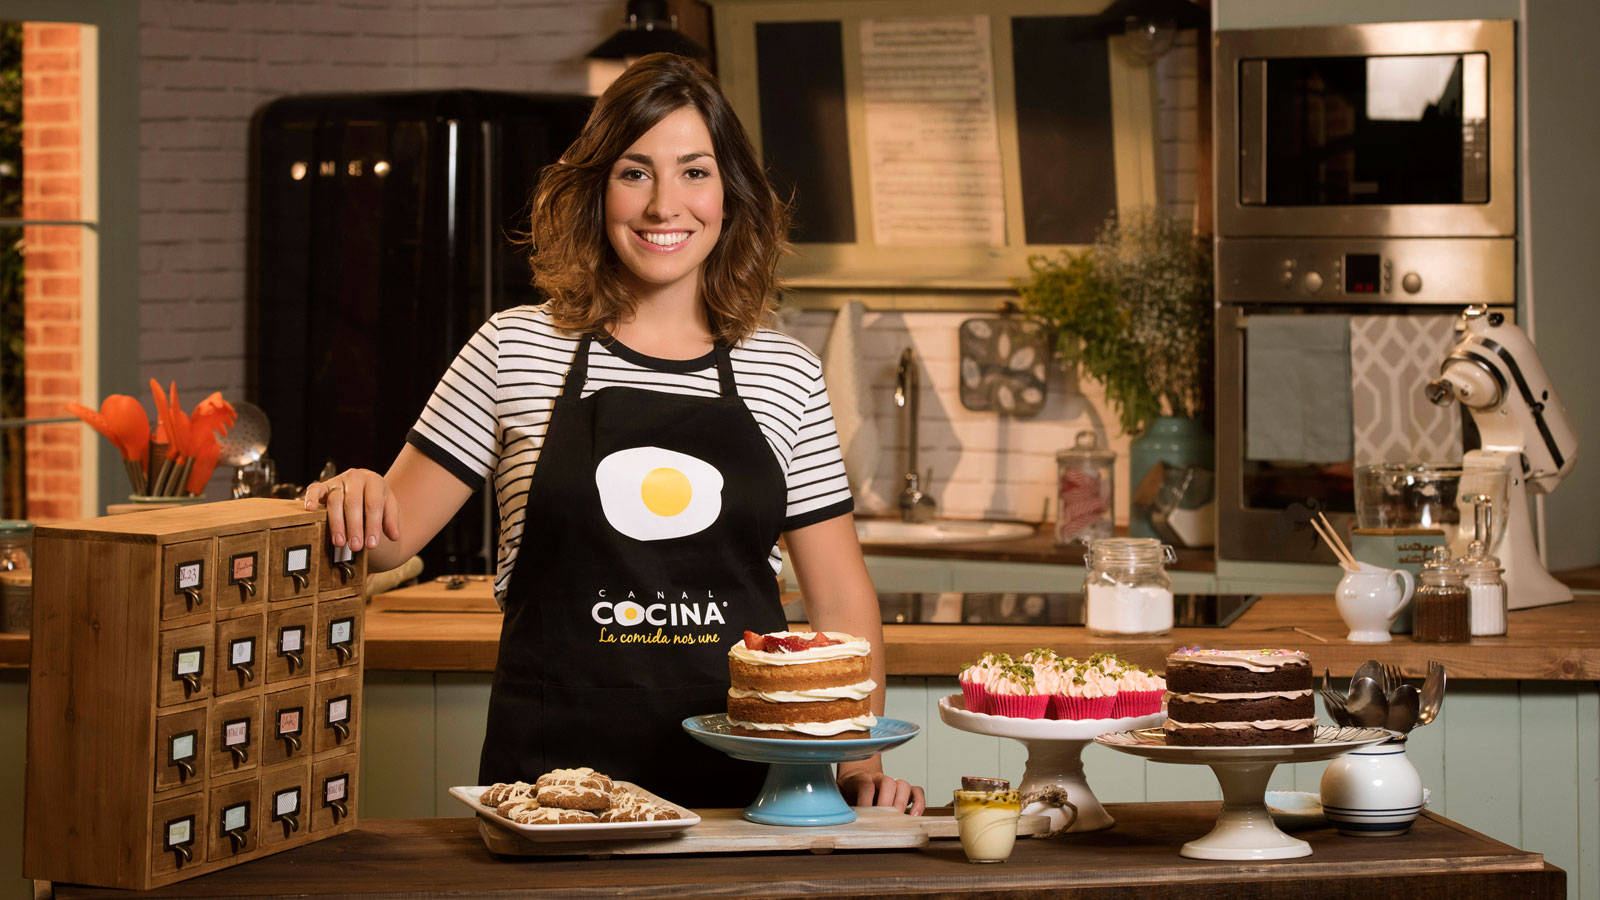 Alma obreg n vuelve a canal cocina con el estreno exclusivo de la segunda temporada de dulces - Cocina con alma ...